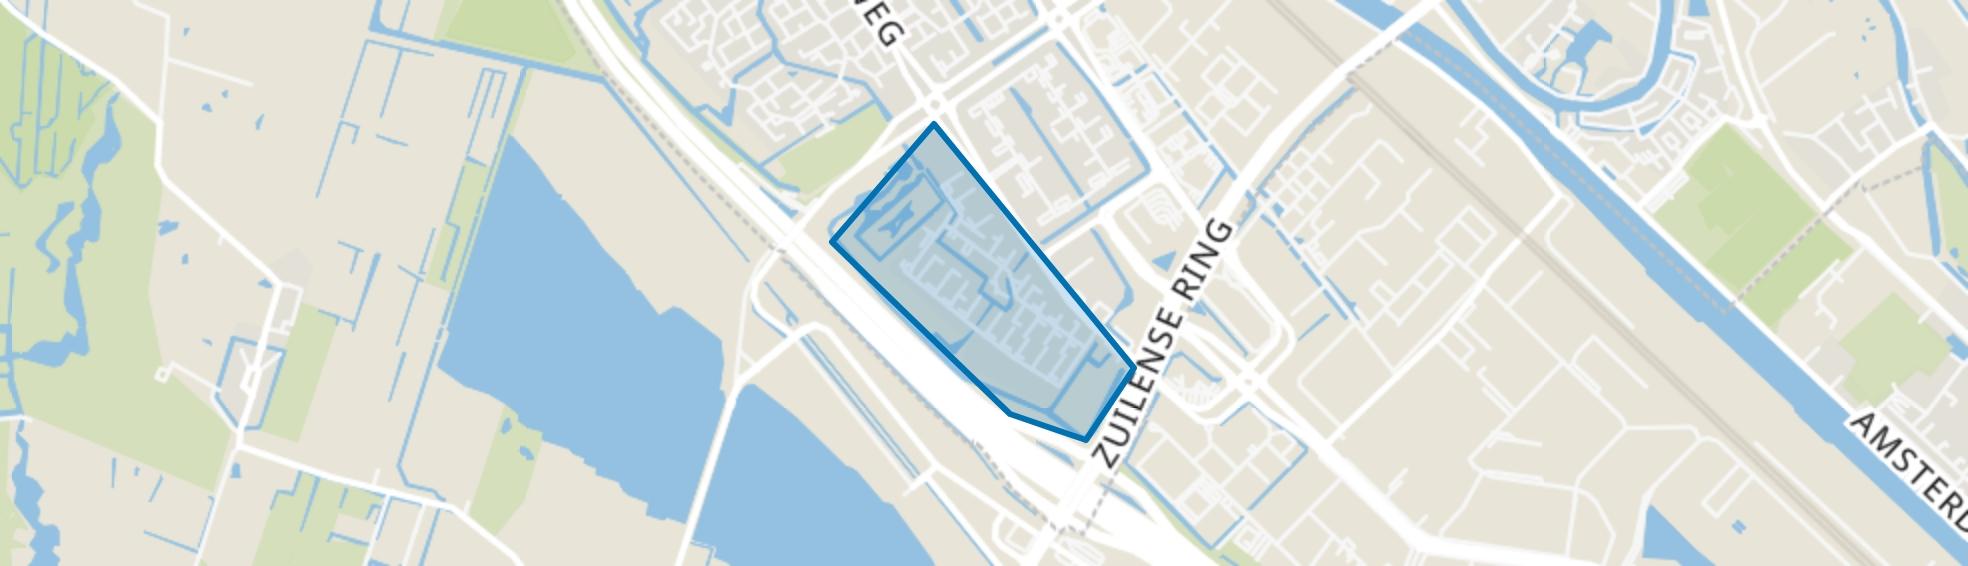 Boomstede, Maarssen map